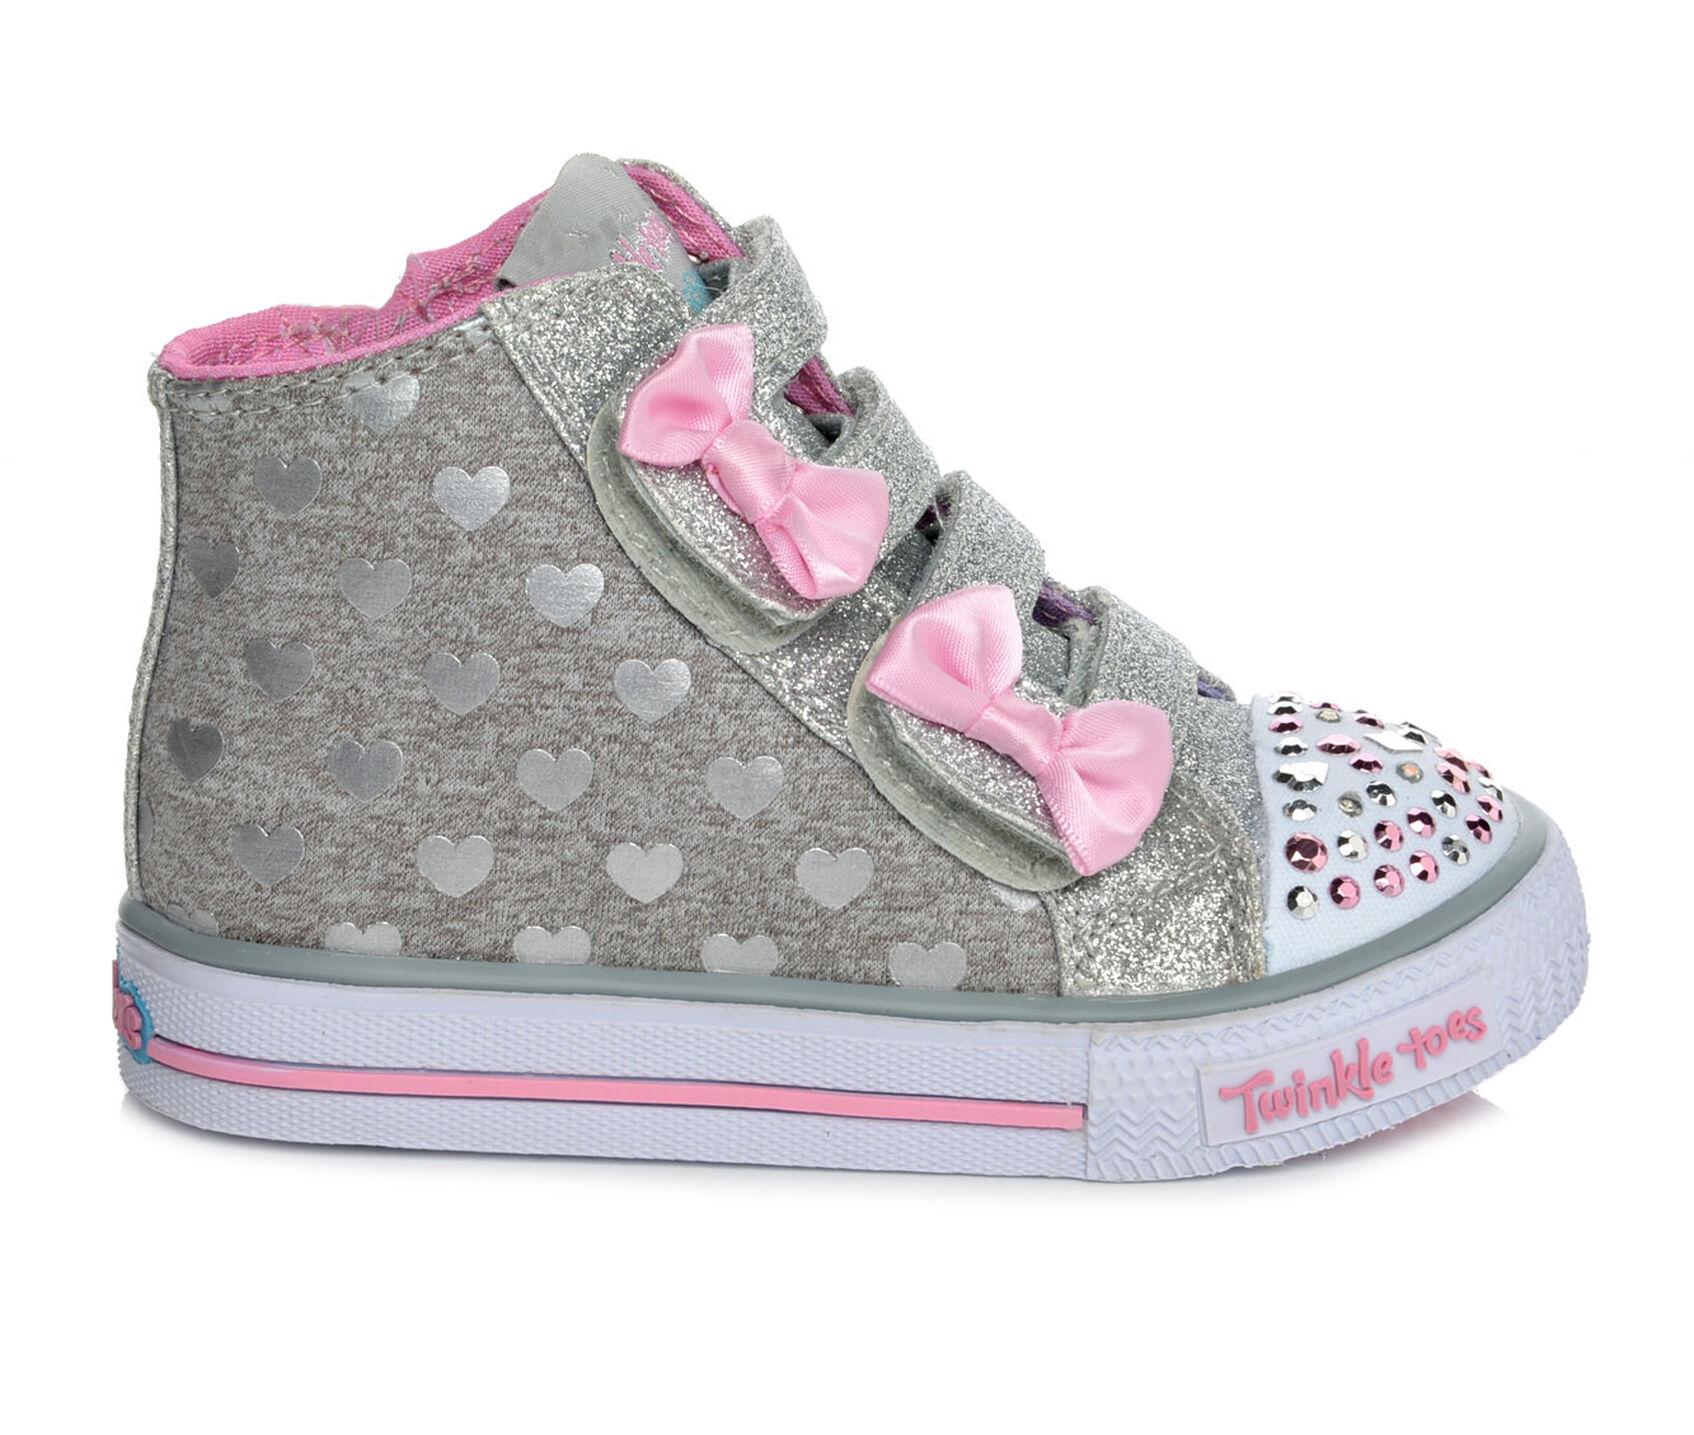 9a0e7fc260d9 Girls  Skechers Toddler   Little Kid Doodle Days High Top Light-Up Sneakers